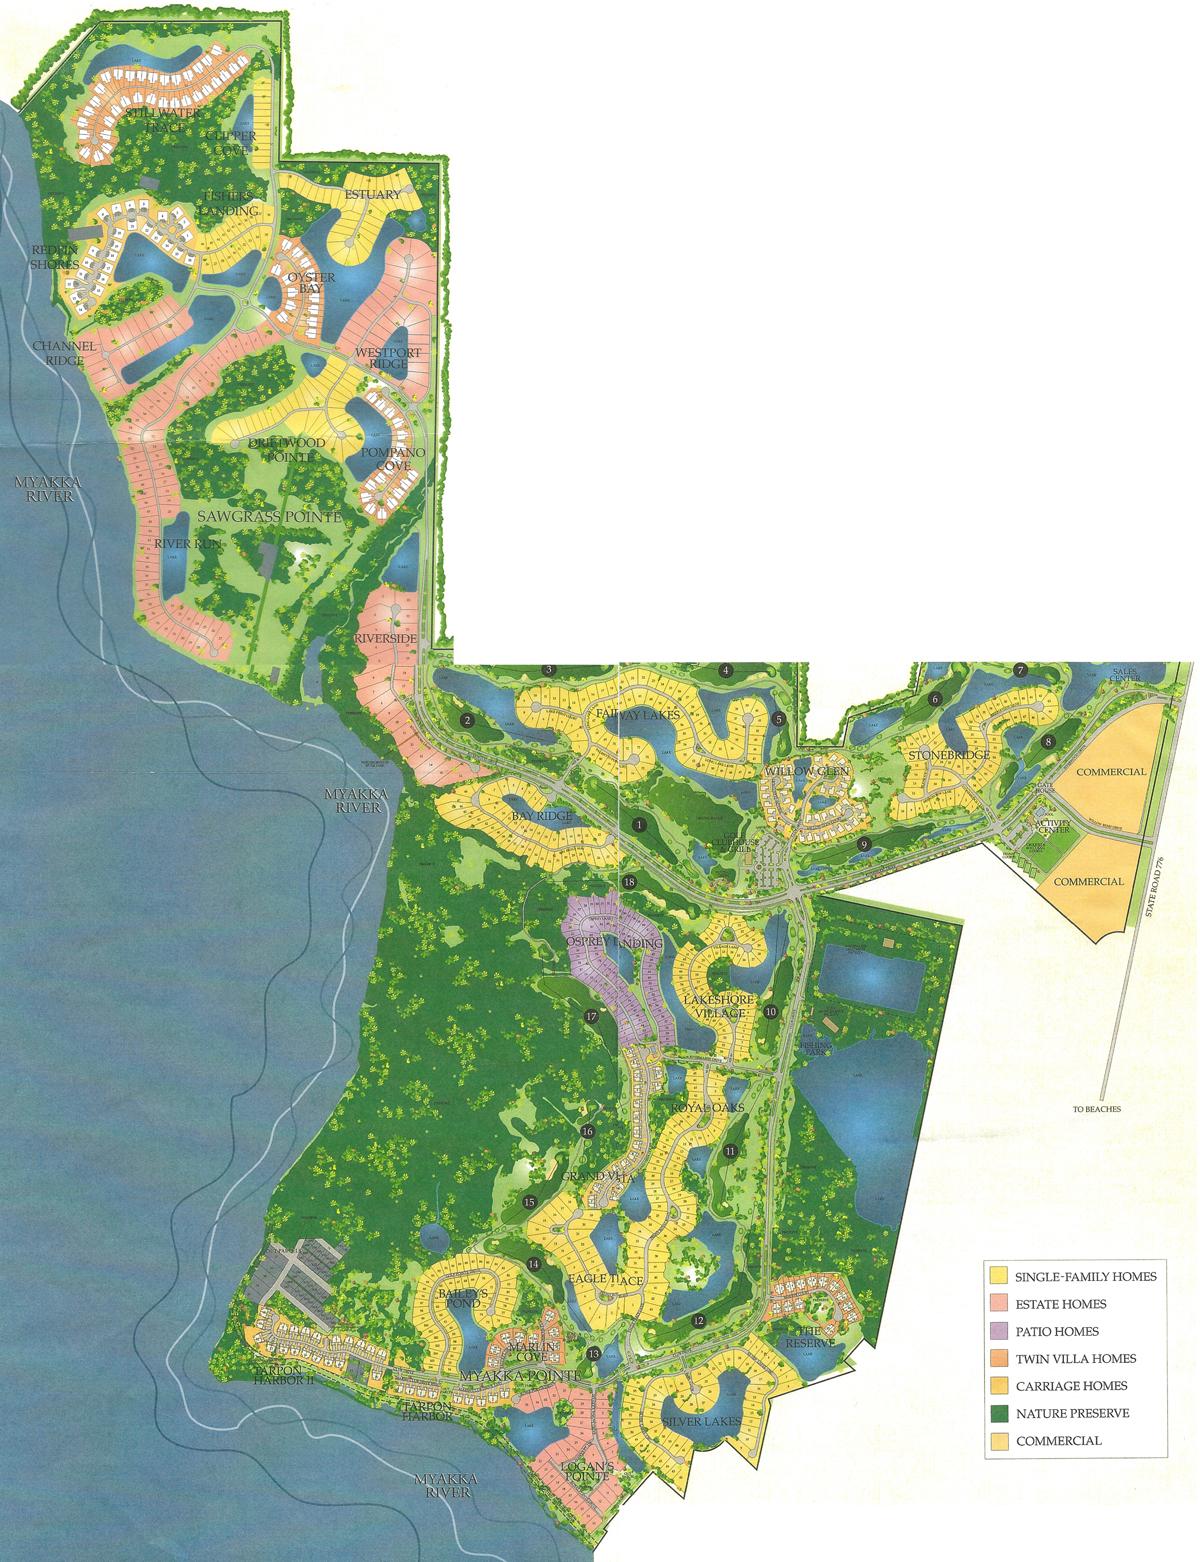 map of riverwood in port charlotte fl southwest fl real